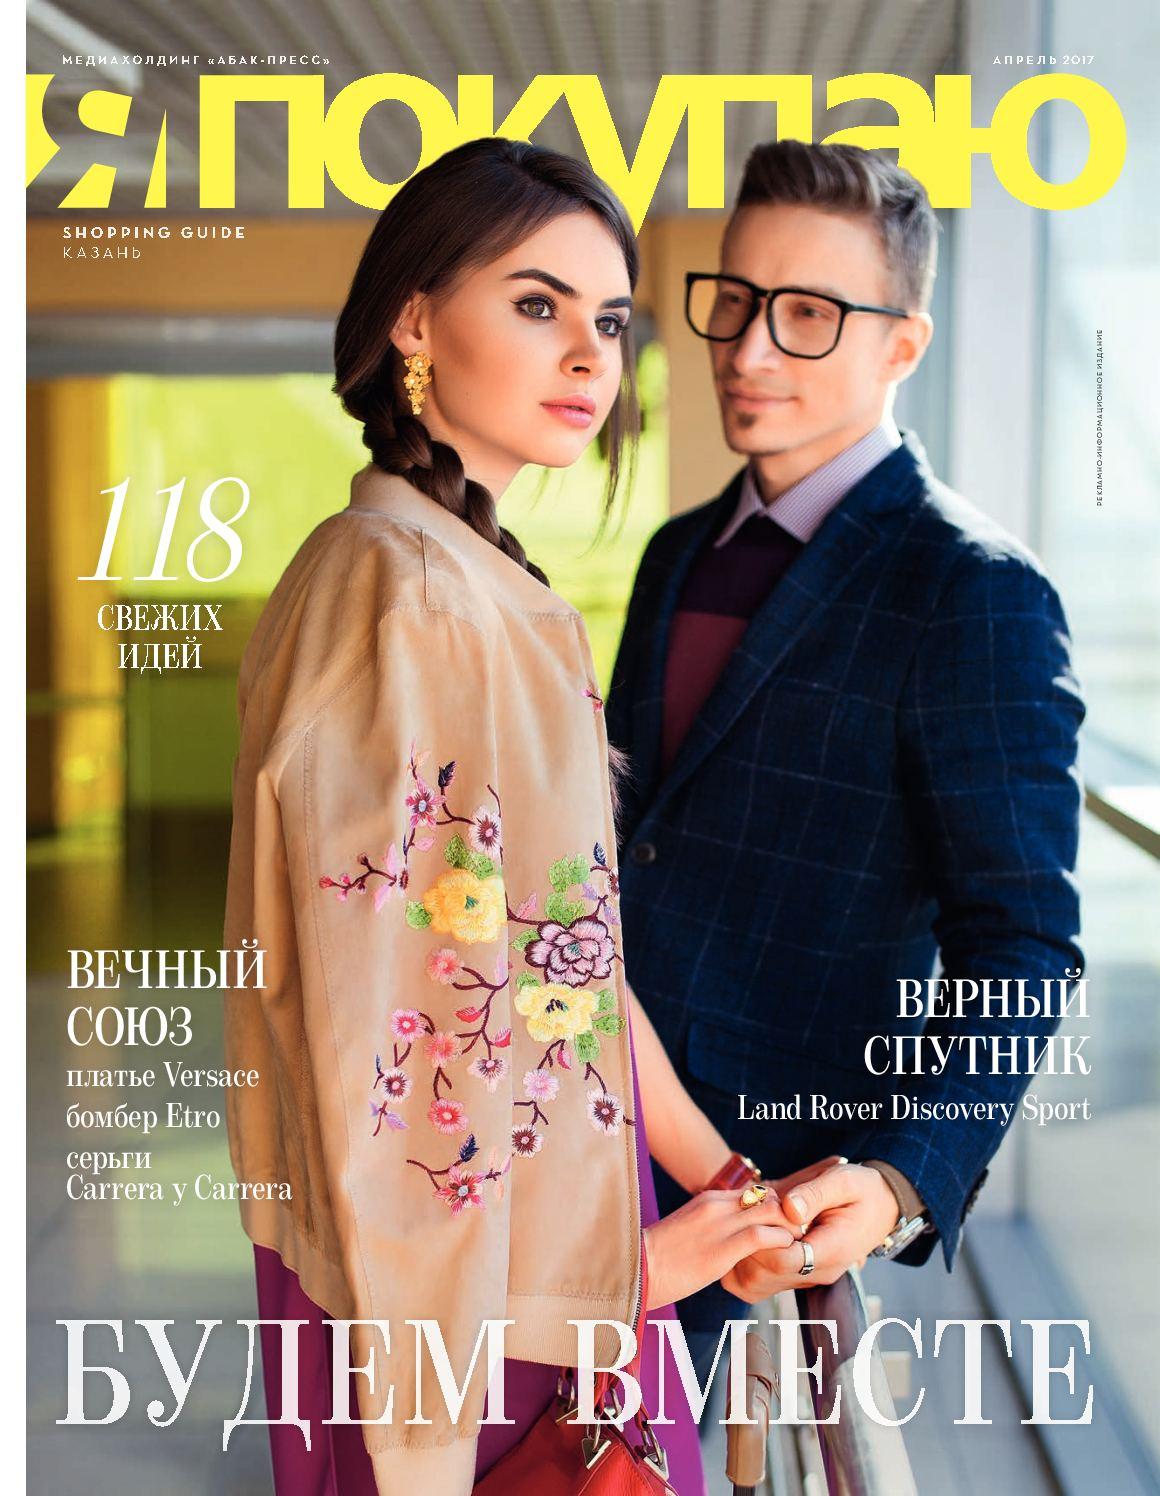 Shopping Guide «Я Покупаю. Казань», апрель 2017